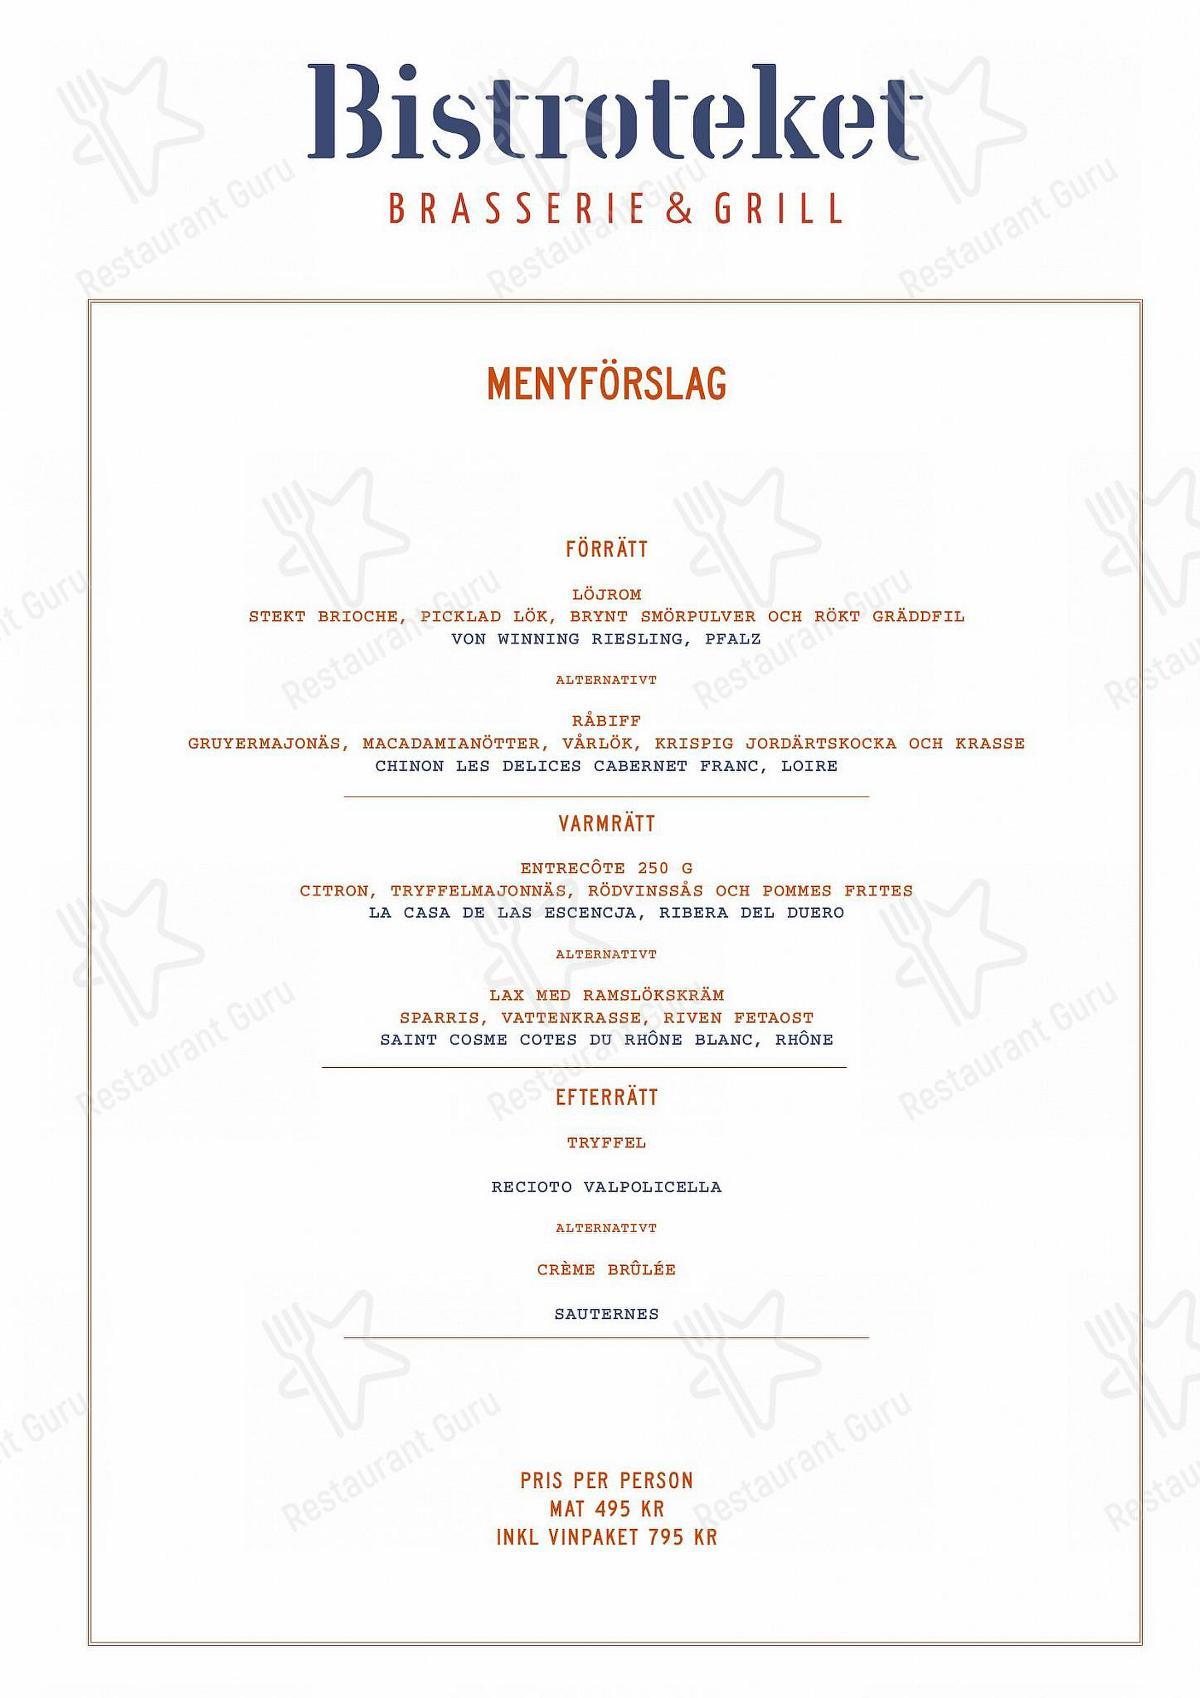 Bistroteket menu